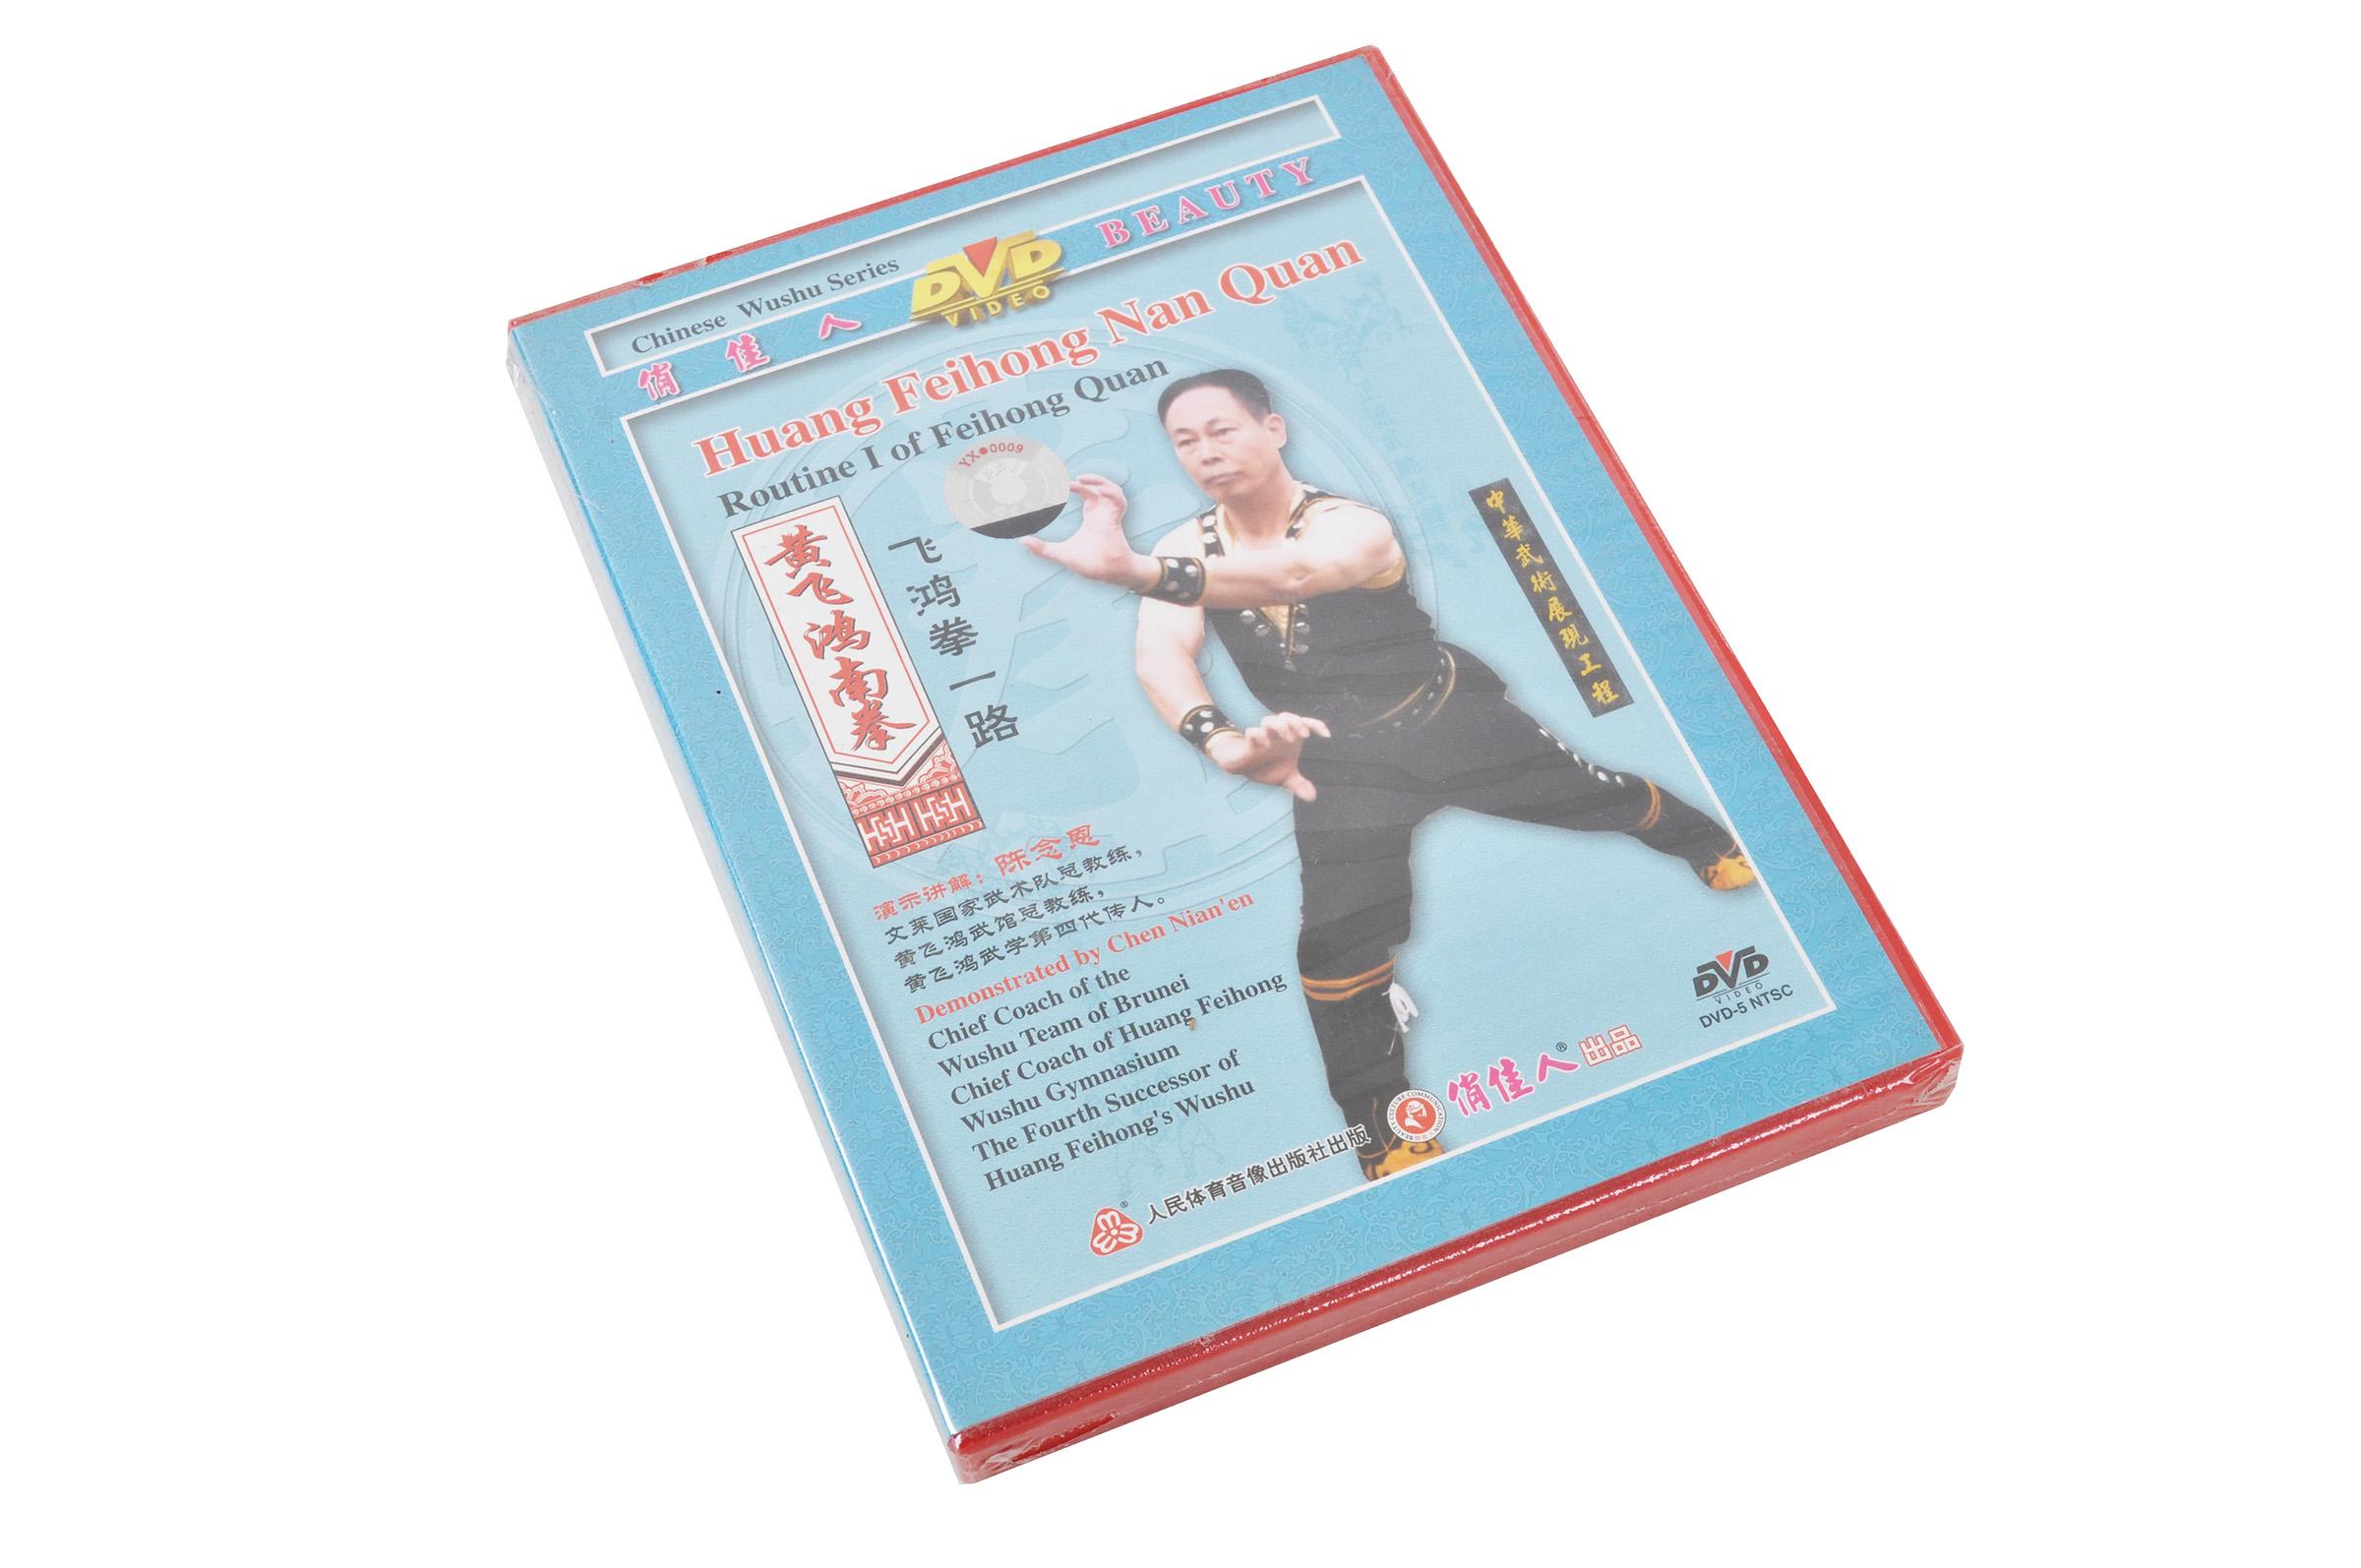 [DVD] Série Nan Quan Routine I